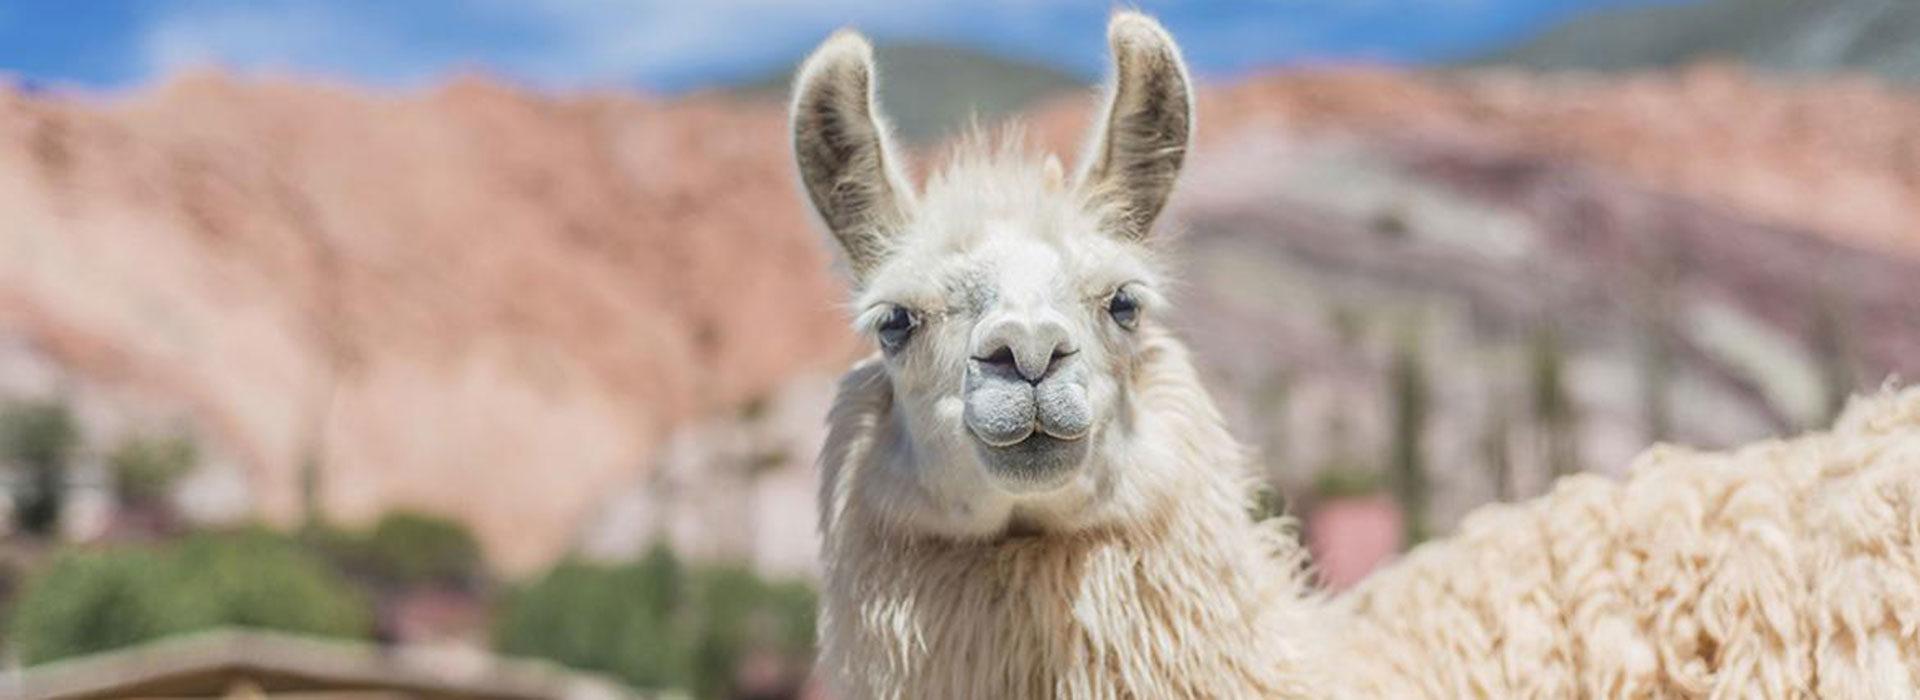 Llama - Jujuy